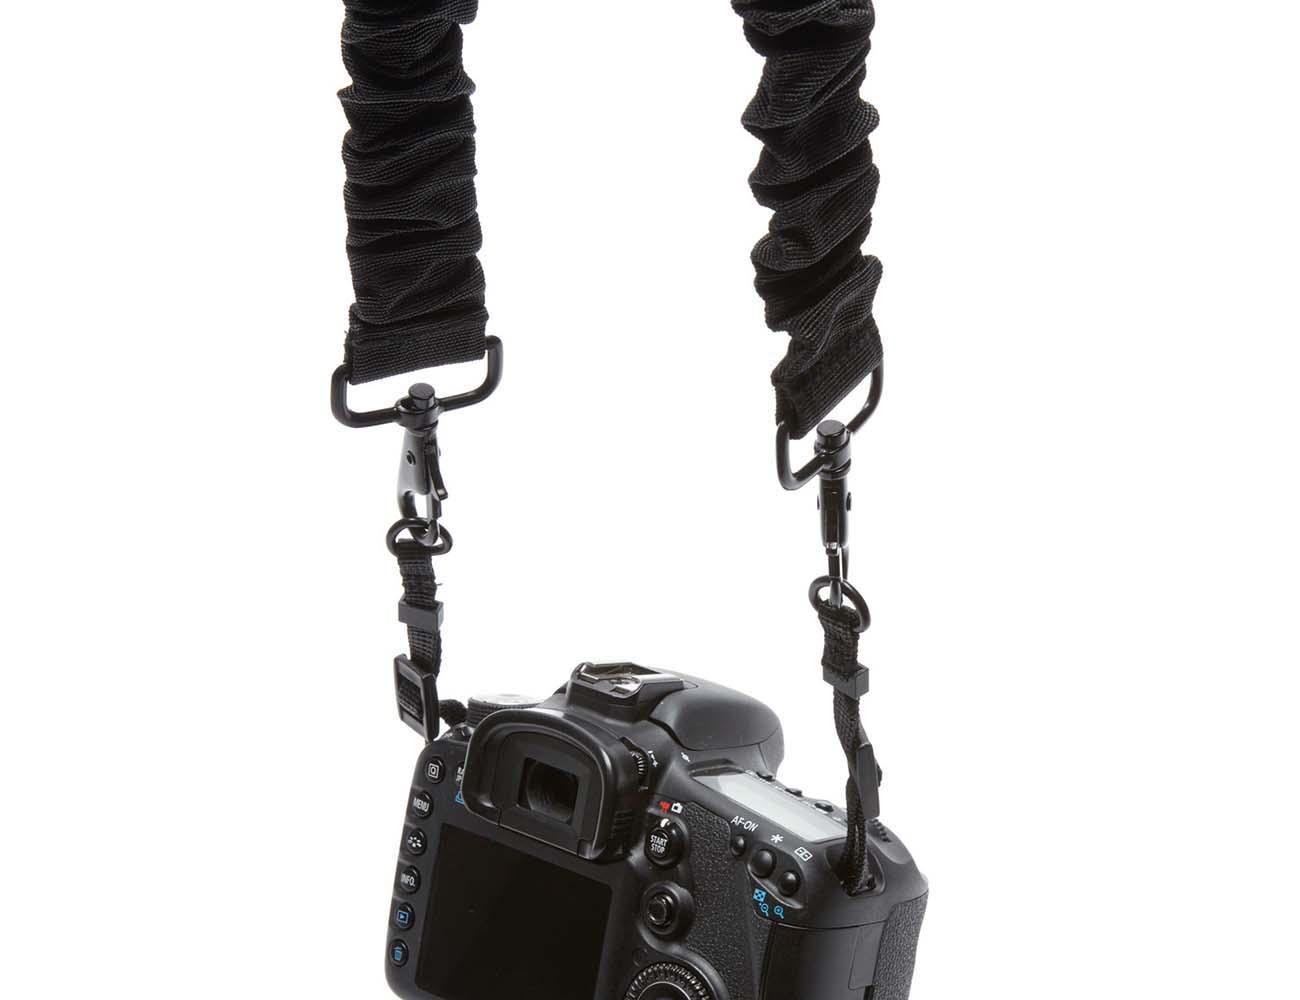 Boomr – Bungee Camera Strap